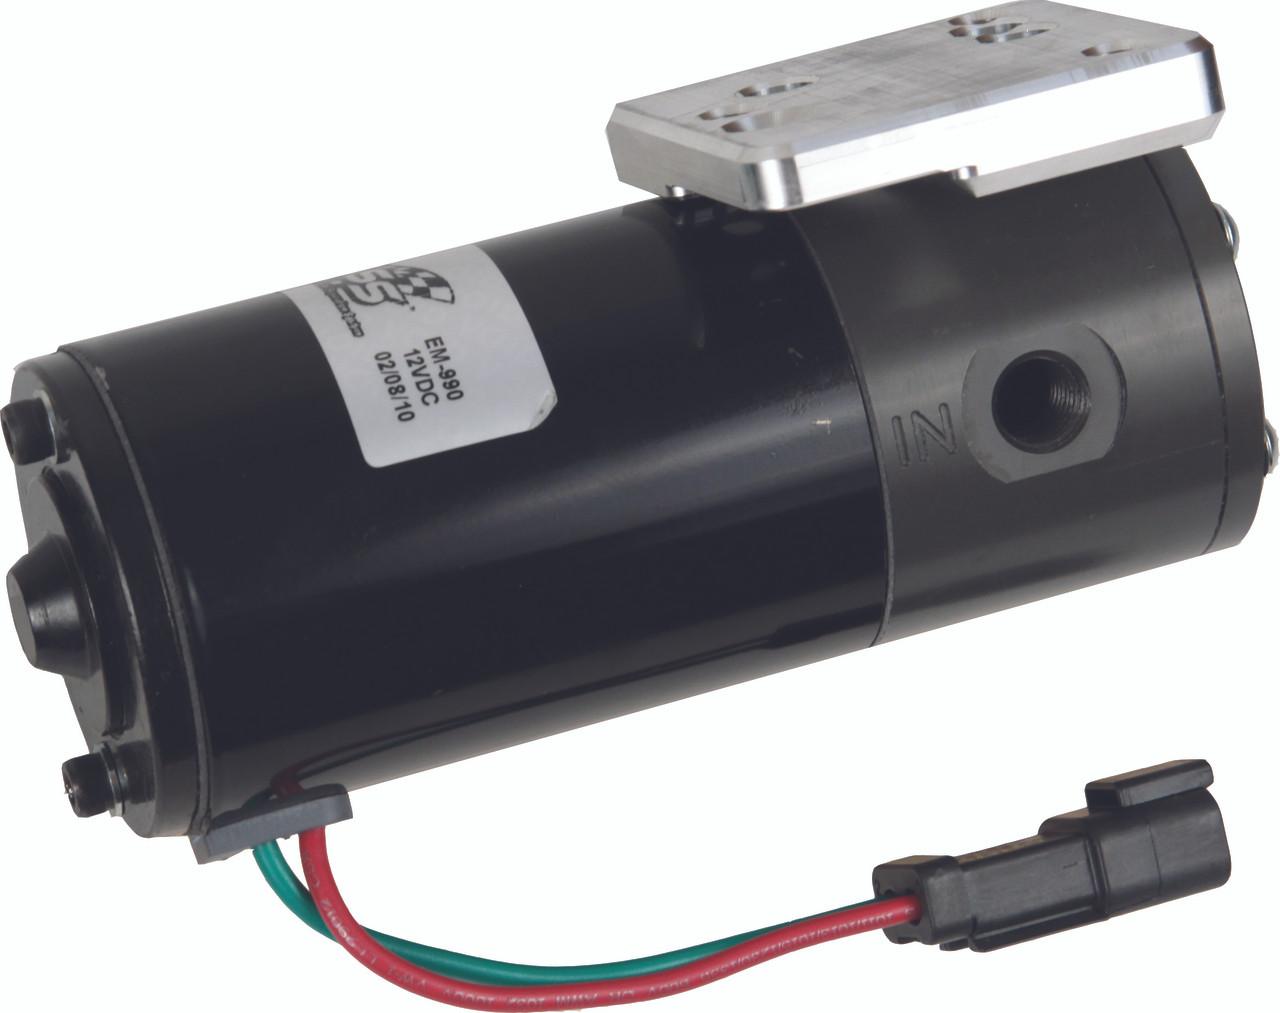 medium resolution of dodge ram cummins drp series diesel fuel pump by fass fuel systems